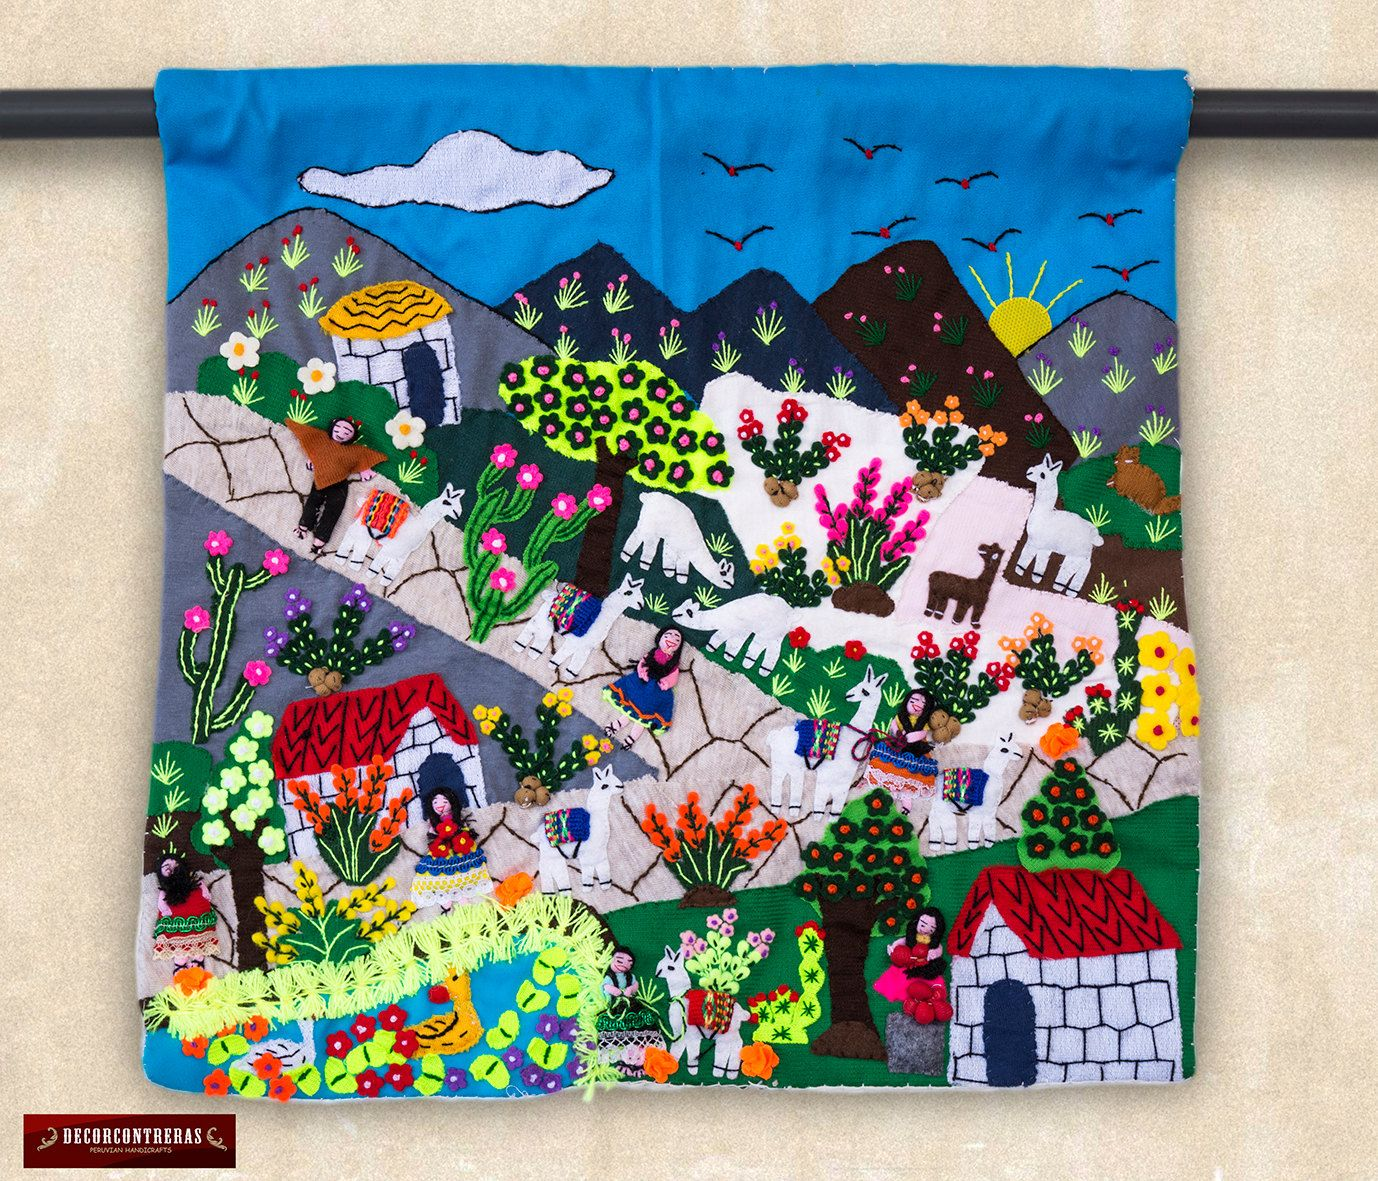 Applique Colgante De Pared De 40x40cm Arpillera Arte Popular Del Peru Collage Textil Decoracion Ho Folk Embroidery Quilted Wall Hangings Learn Embroidery